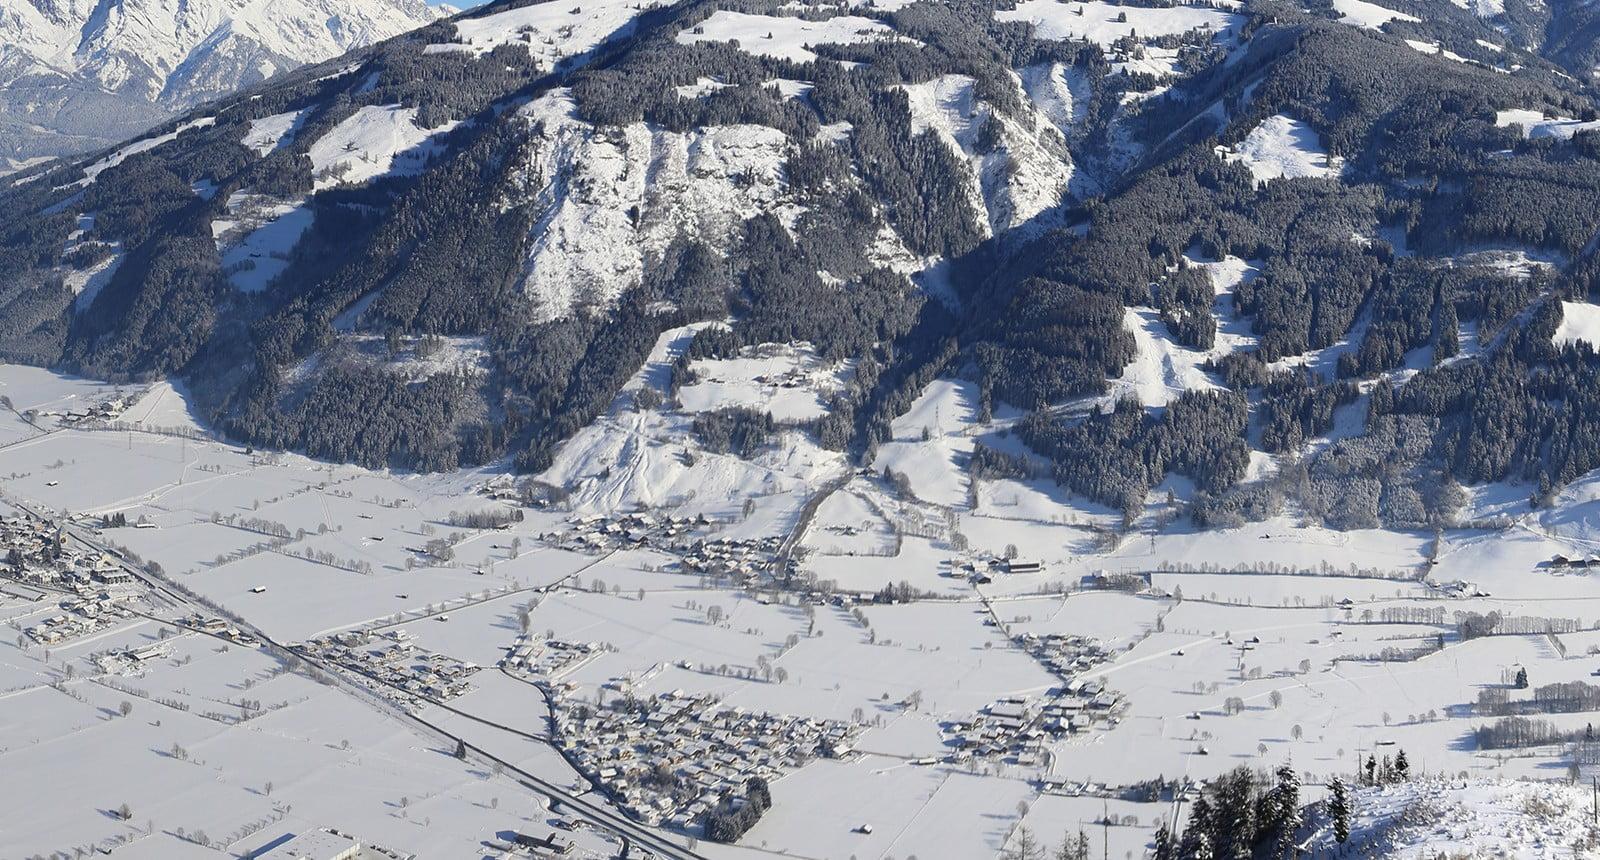 Maishofen winter